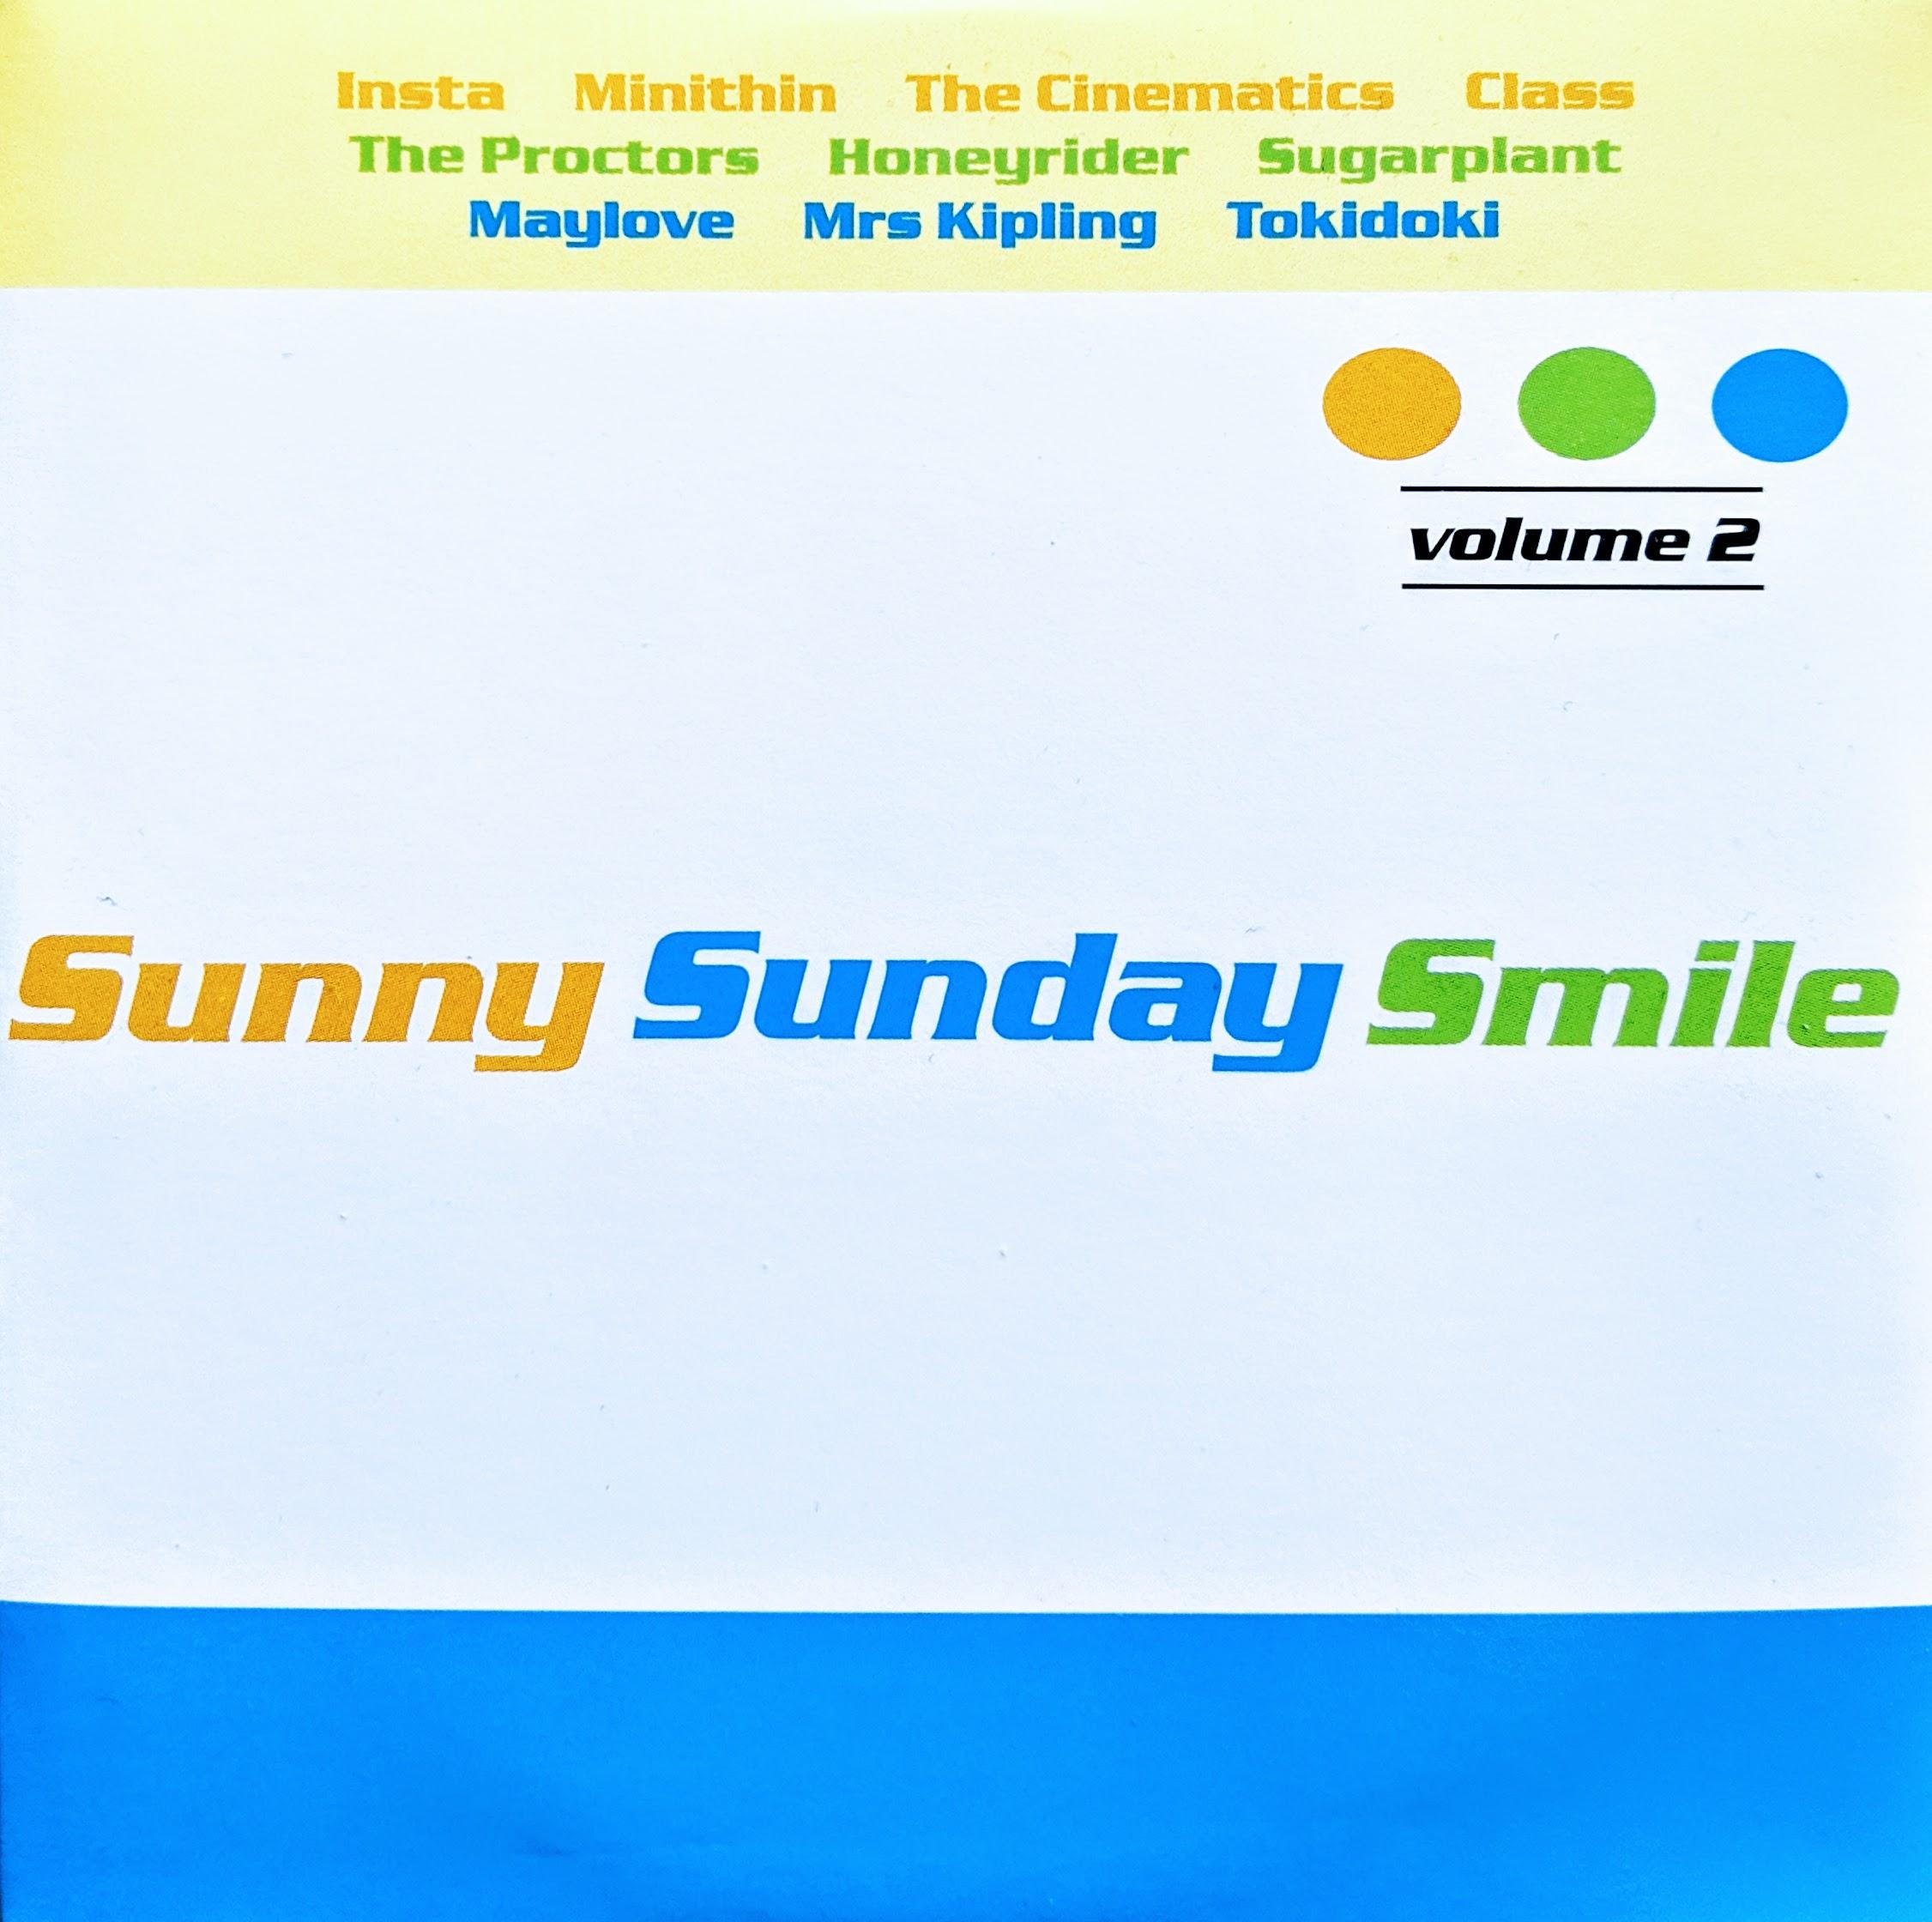 Sunny Sunday Smile Vol 2 CD